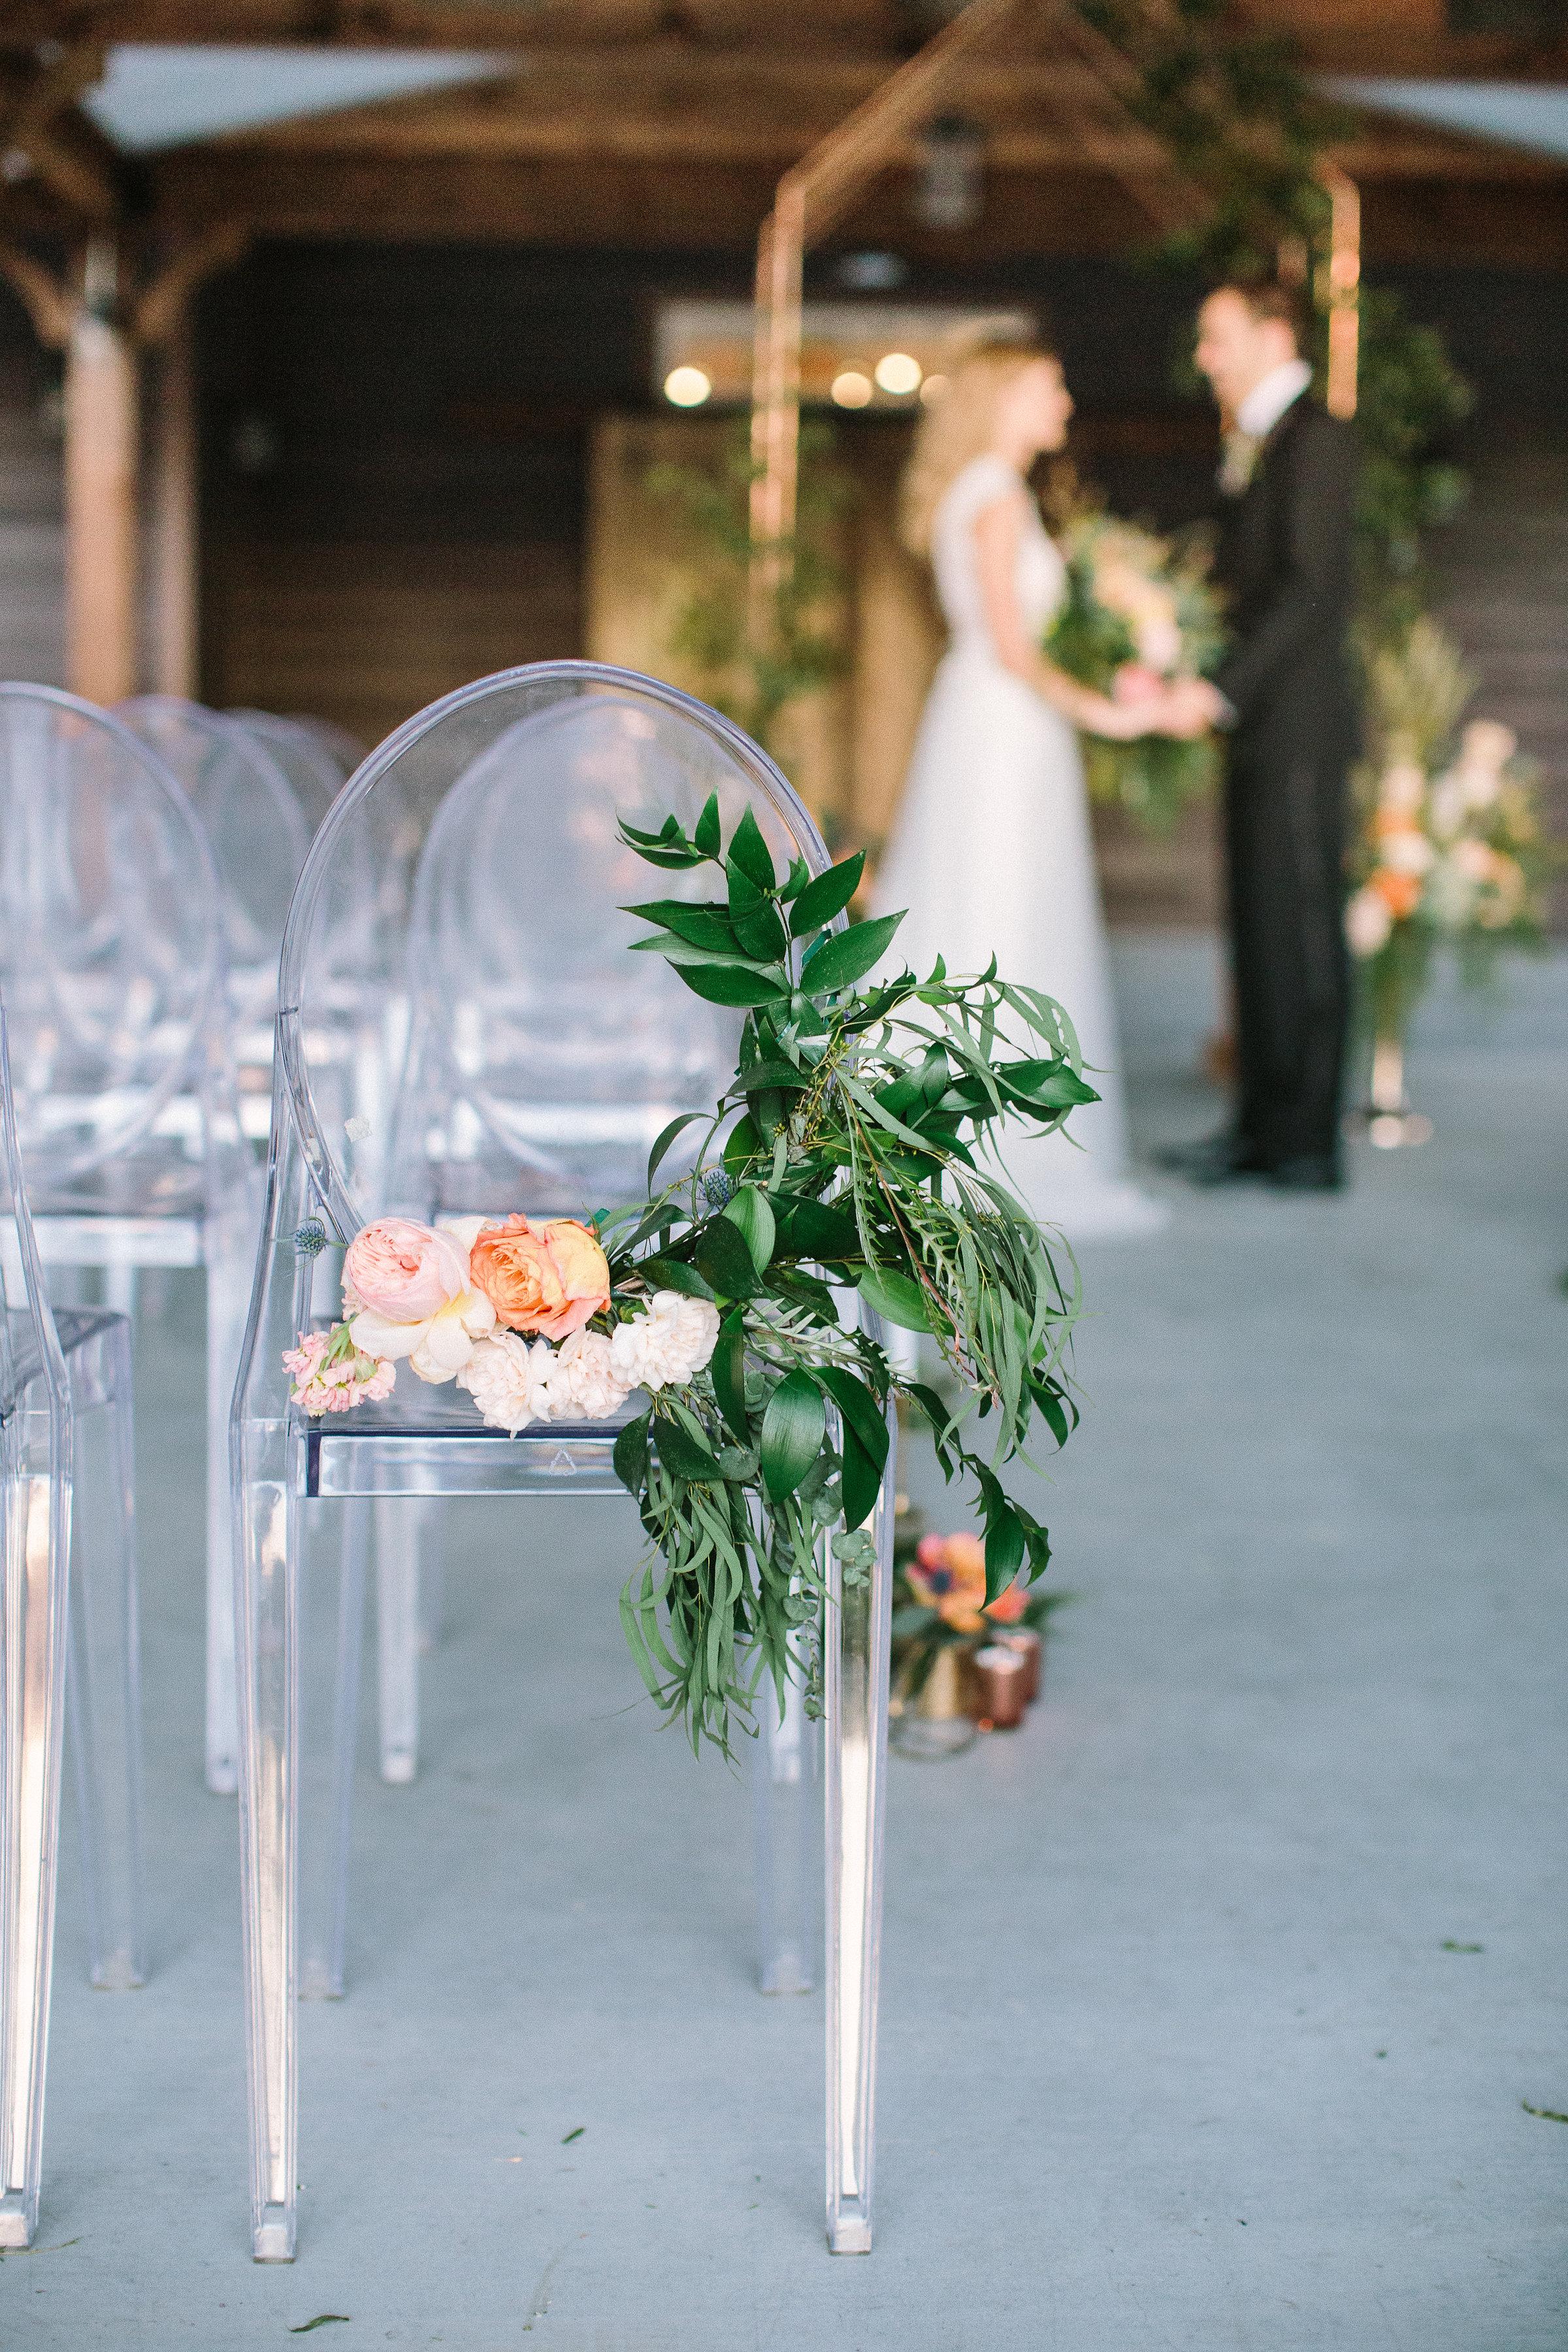 Ellen-Ashton-Photography-Peach-Creek-Ranch-Weddings-Wed-and-Prosper380